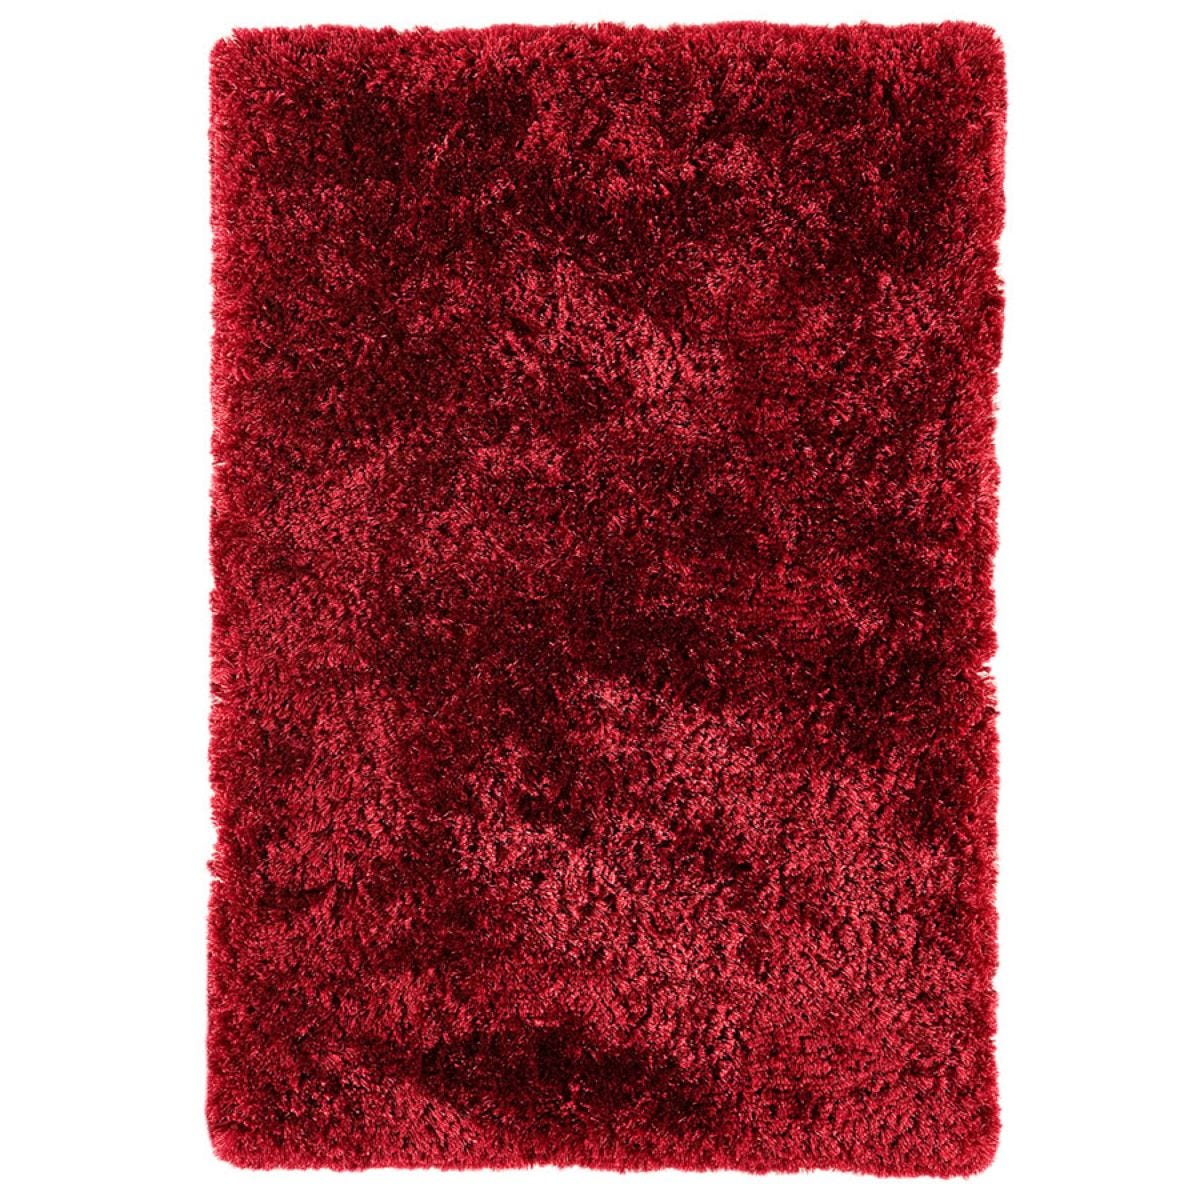 Asiatic Plush Shaggy Rug, 140 x 200cm - Red